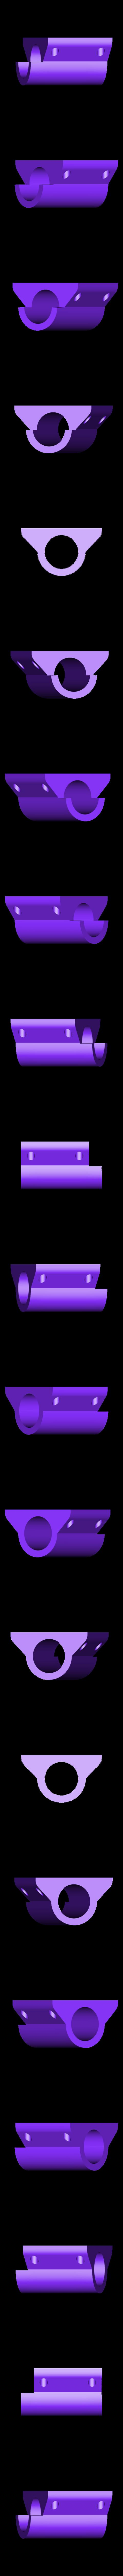 piece_5.stl Download free STL file Picochaise • 3D printer object, PierreR